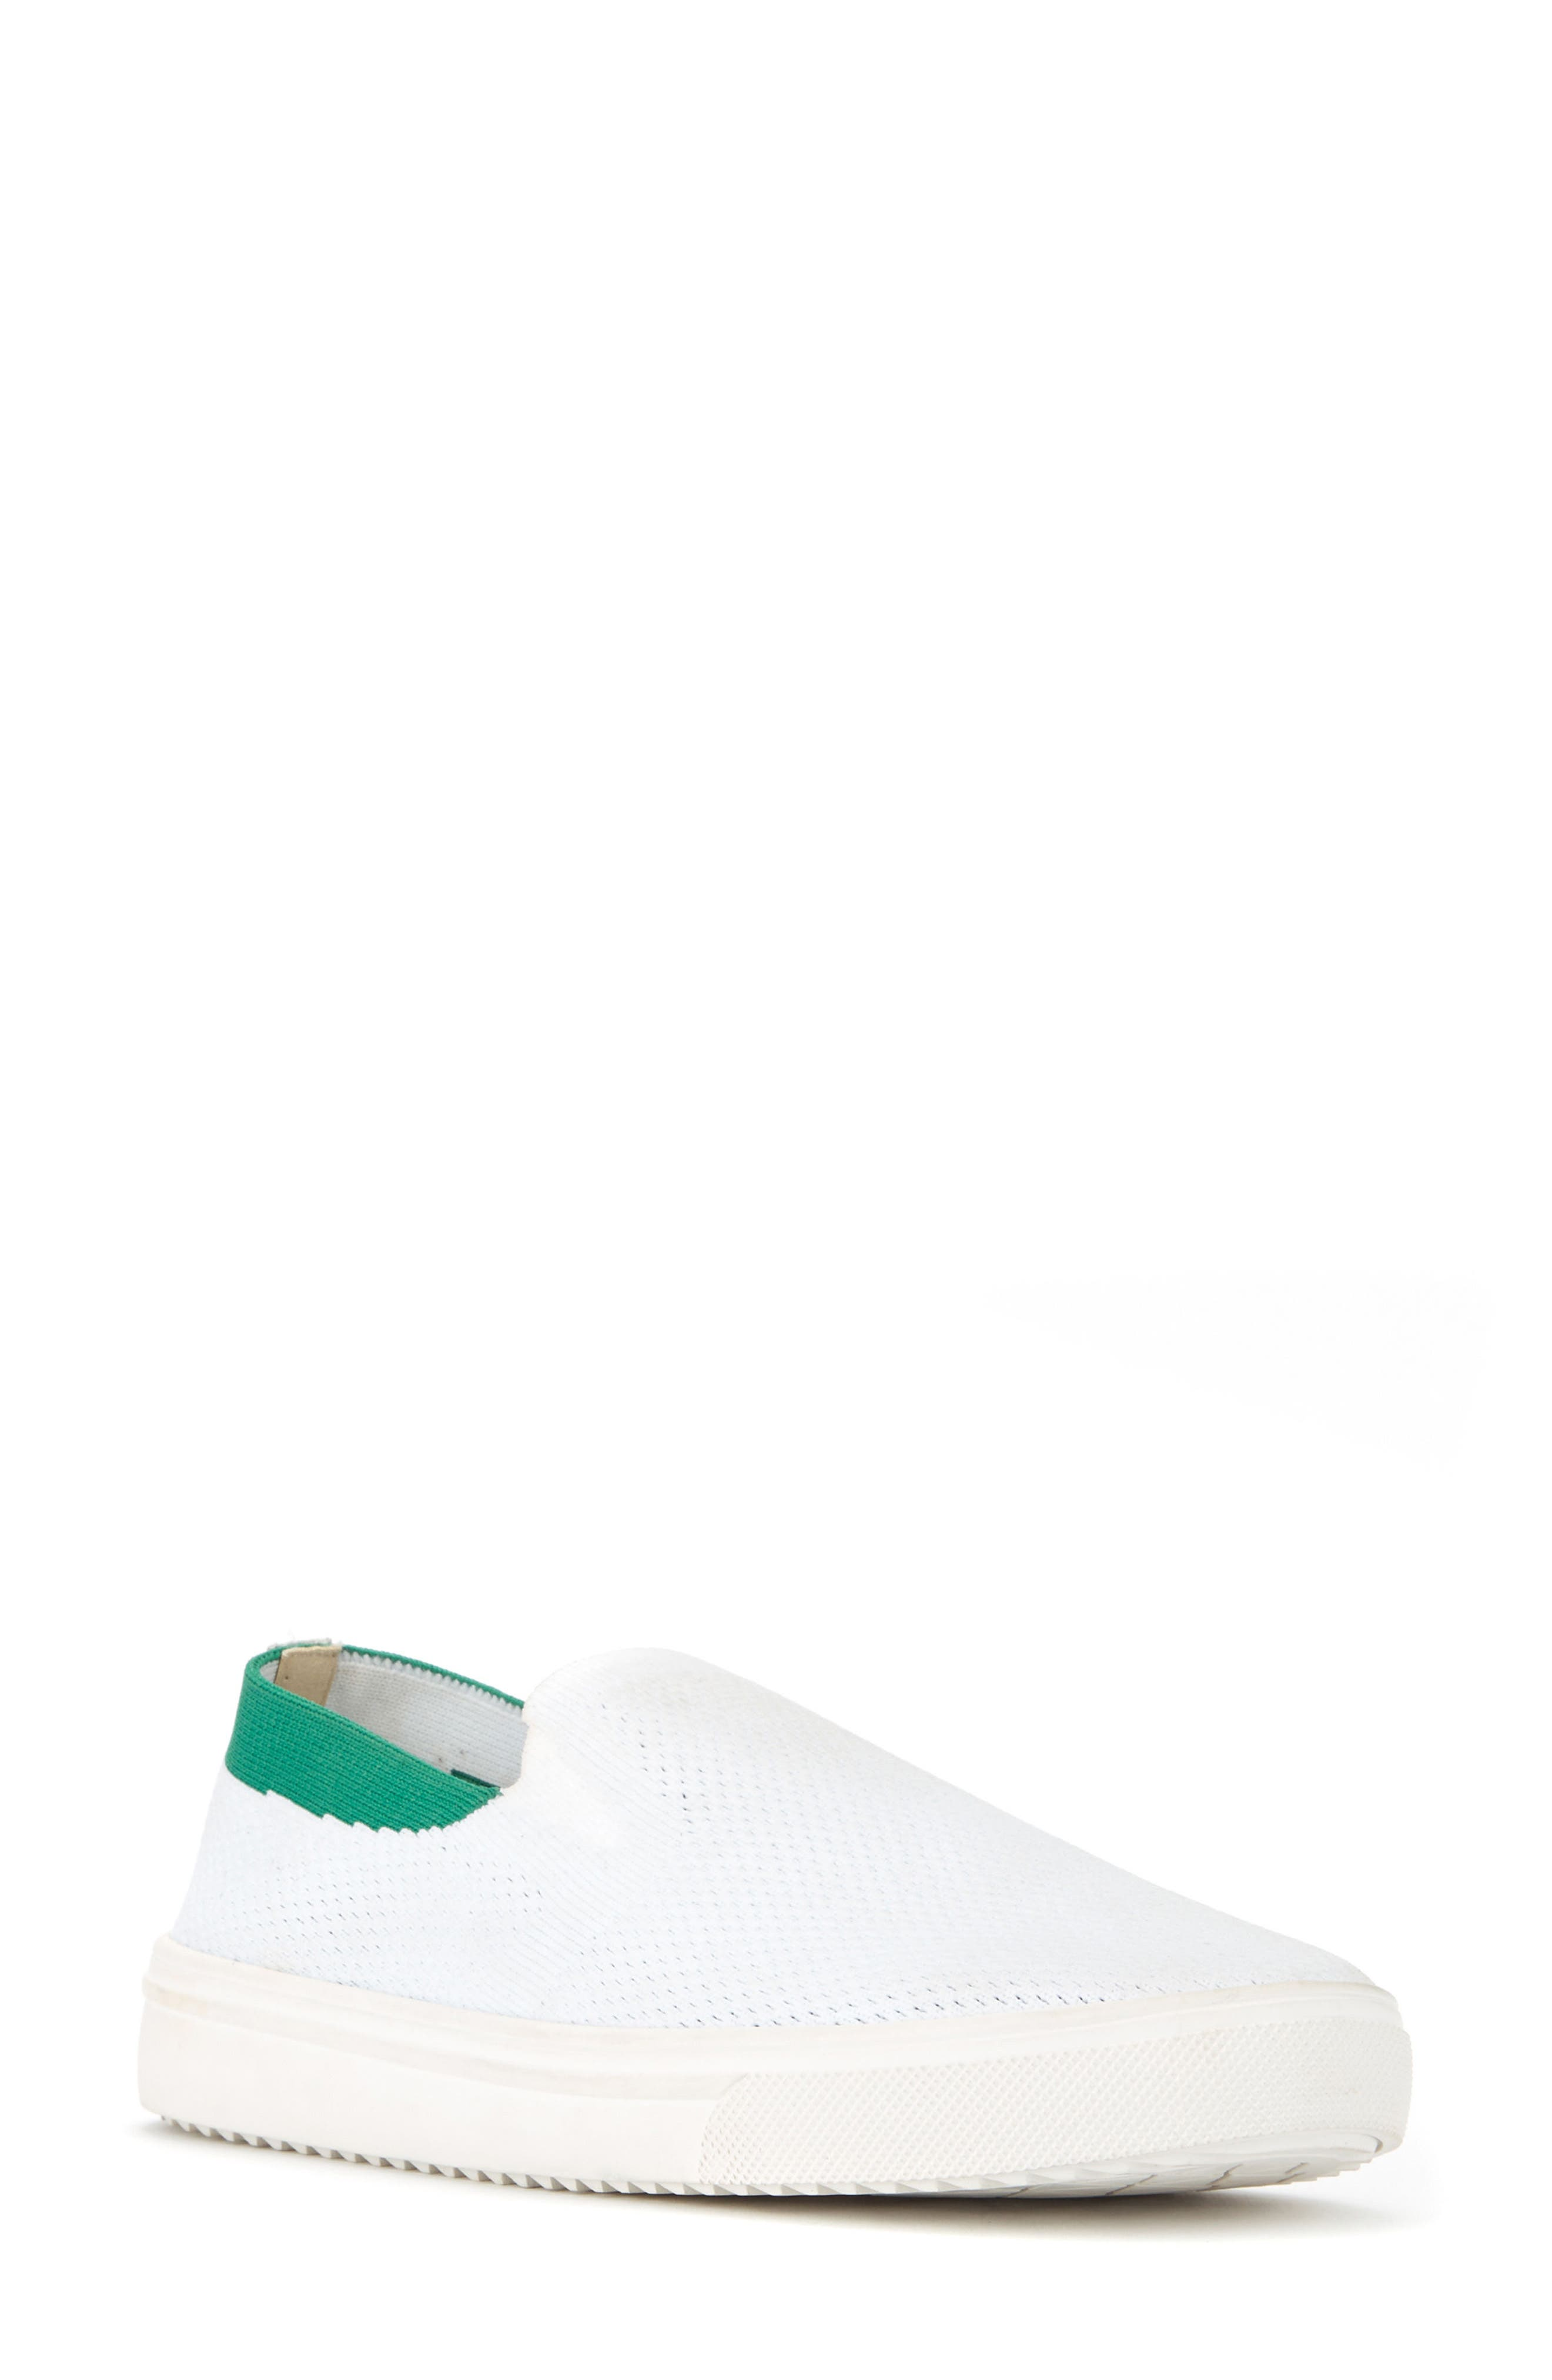 Blondo Gina Waterproof Sneaker (Women)